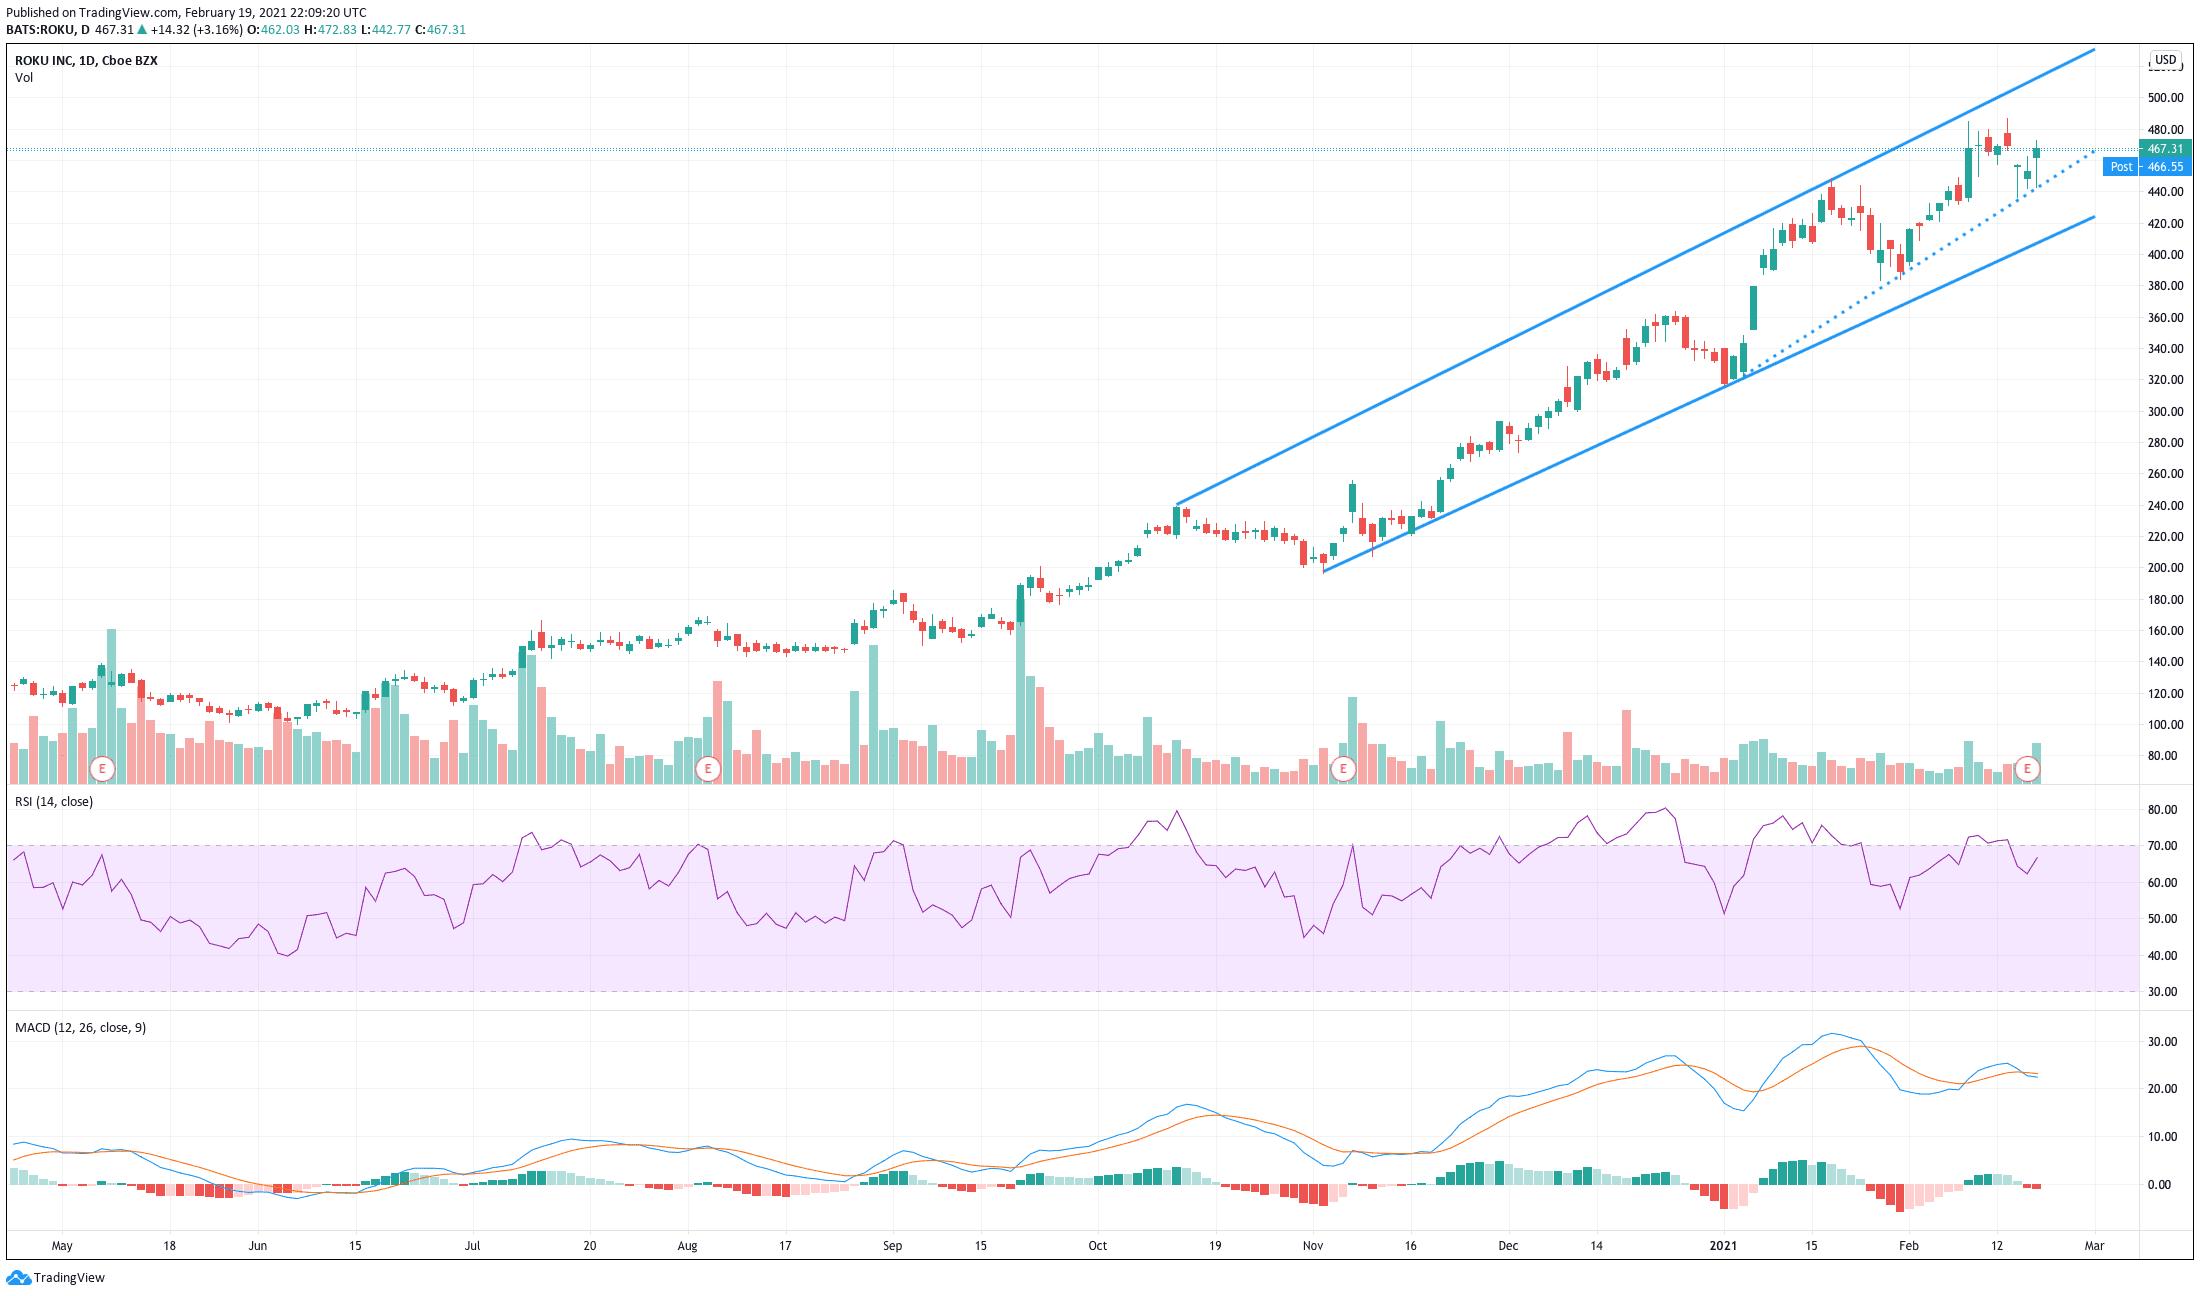 Chart showing the share price performance of Roku, Inc. (ROKU)